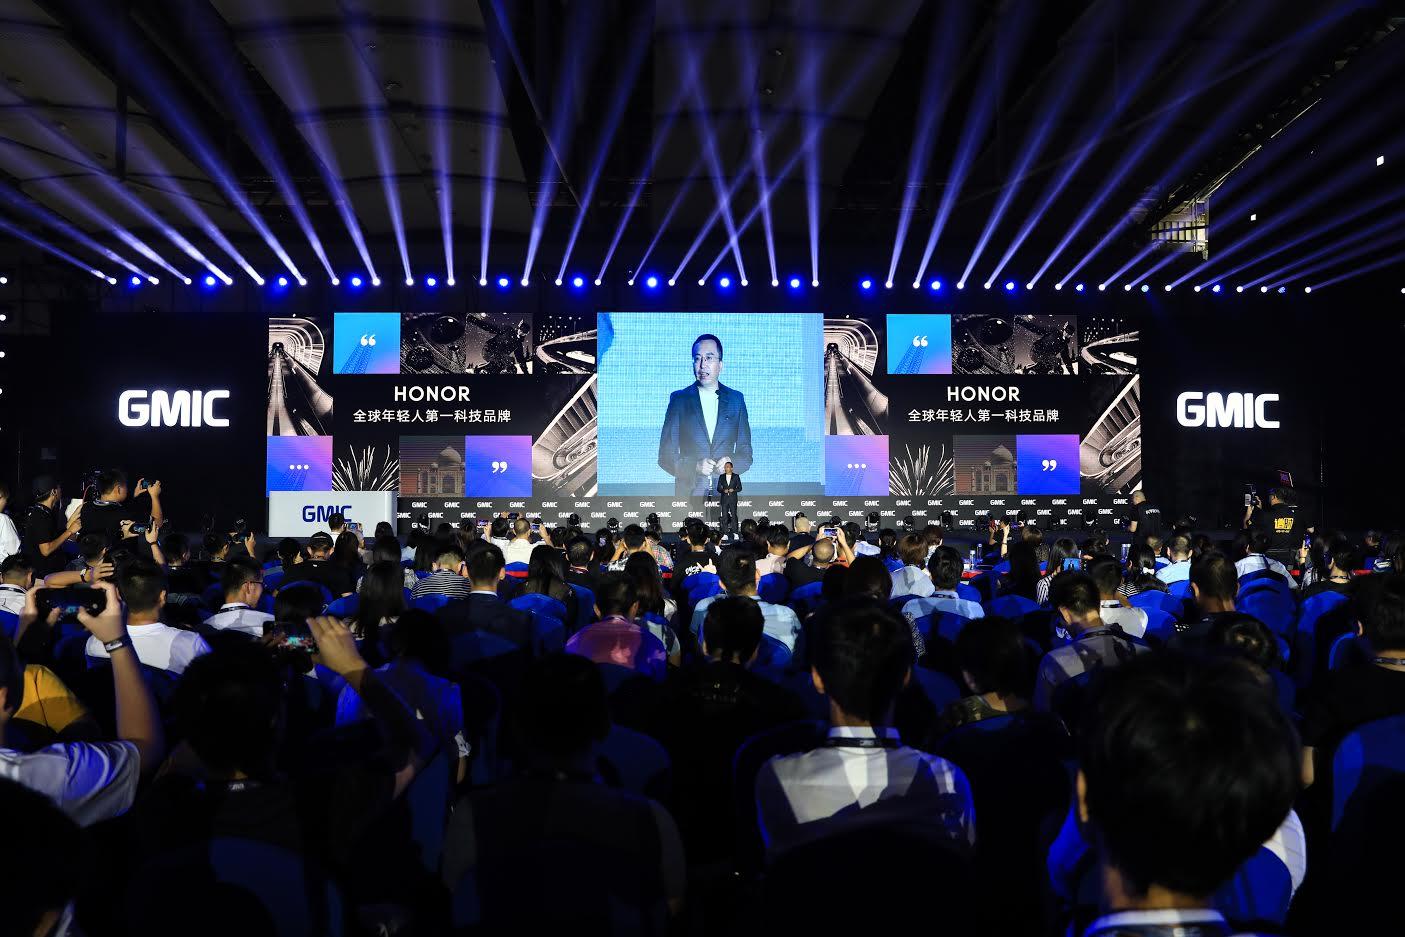 Honor predstavioPocketVision i IoT strategiju